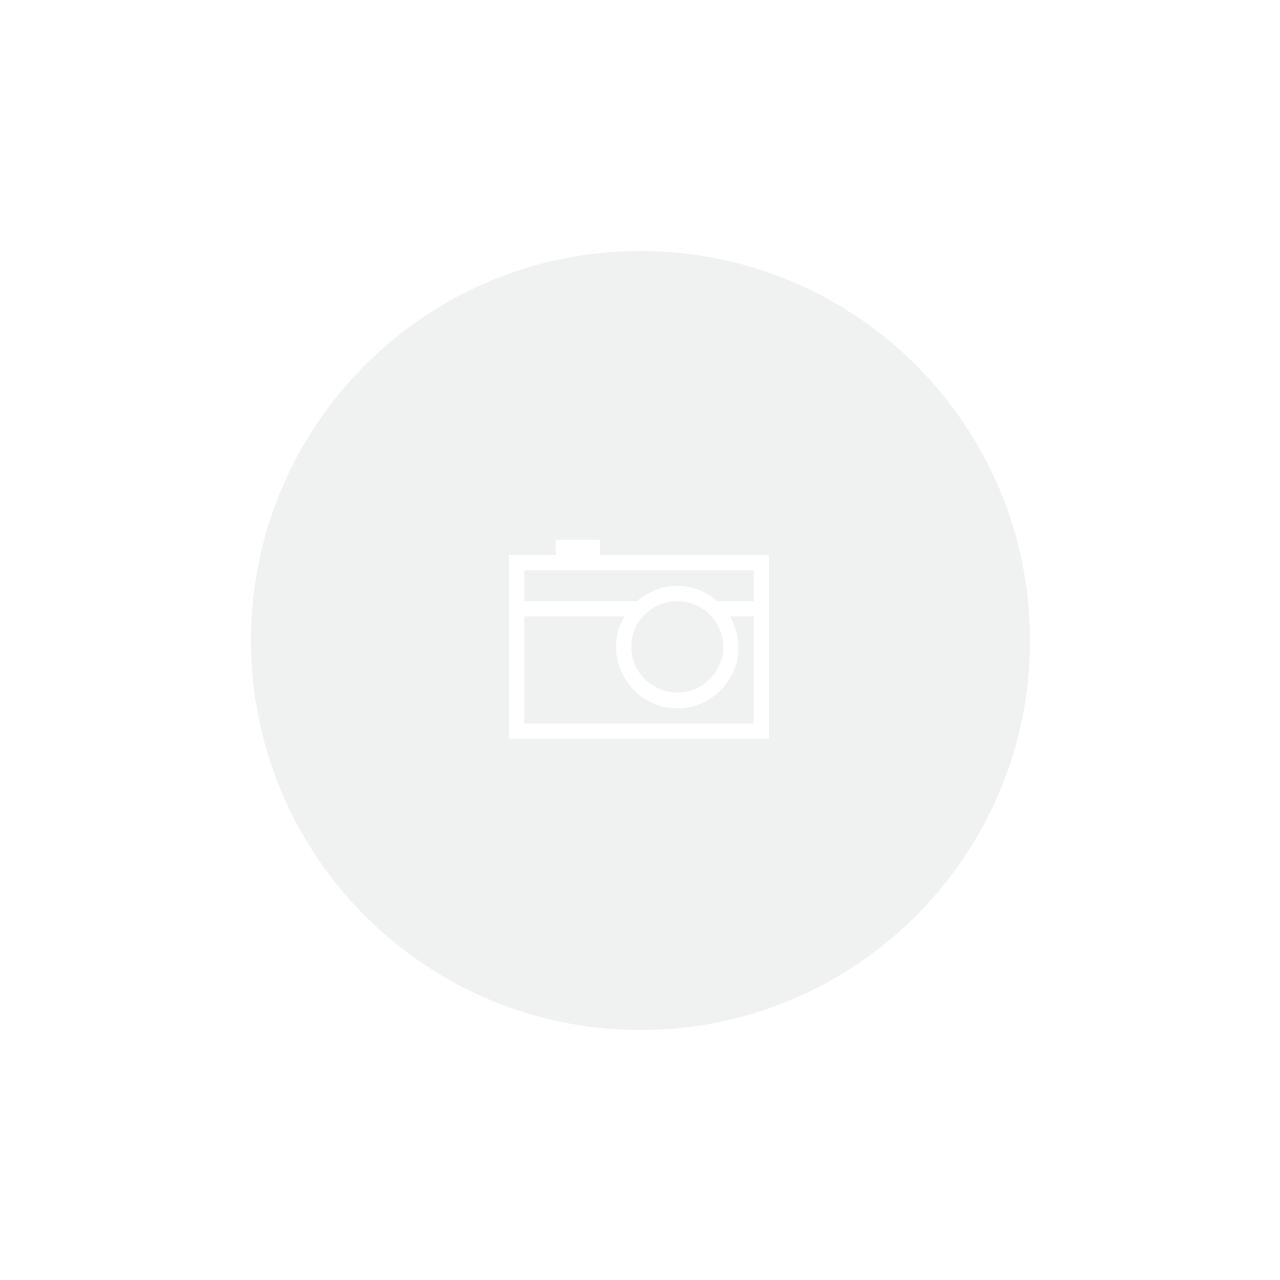 PLACA DE VÍDEO SAPPHIRE PULSE RADEON RX 570 4GB GDDR5 256 BITS, 11266-04-20G